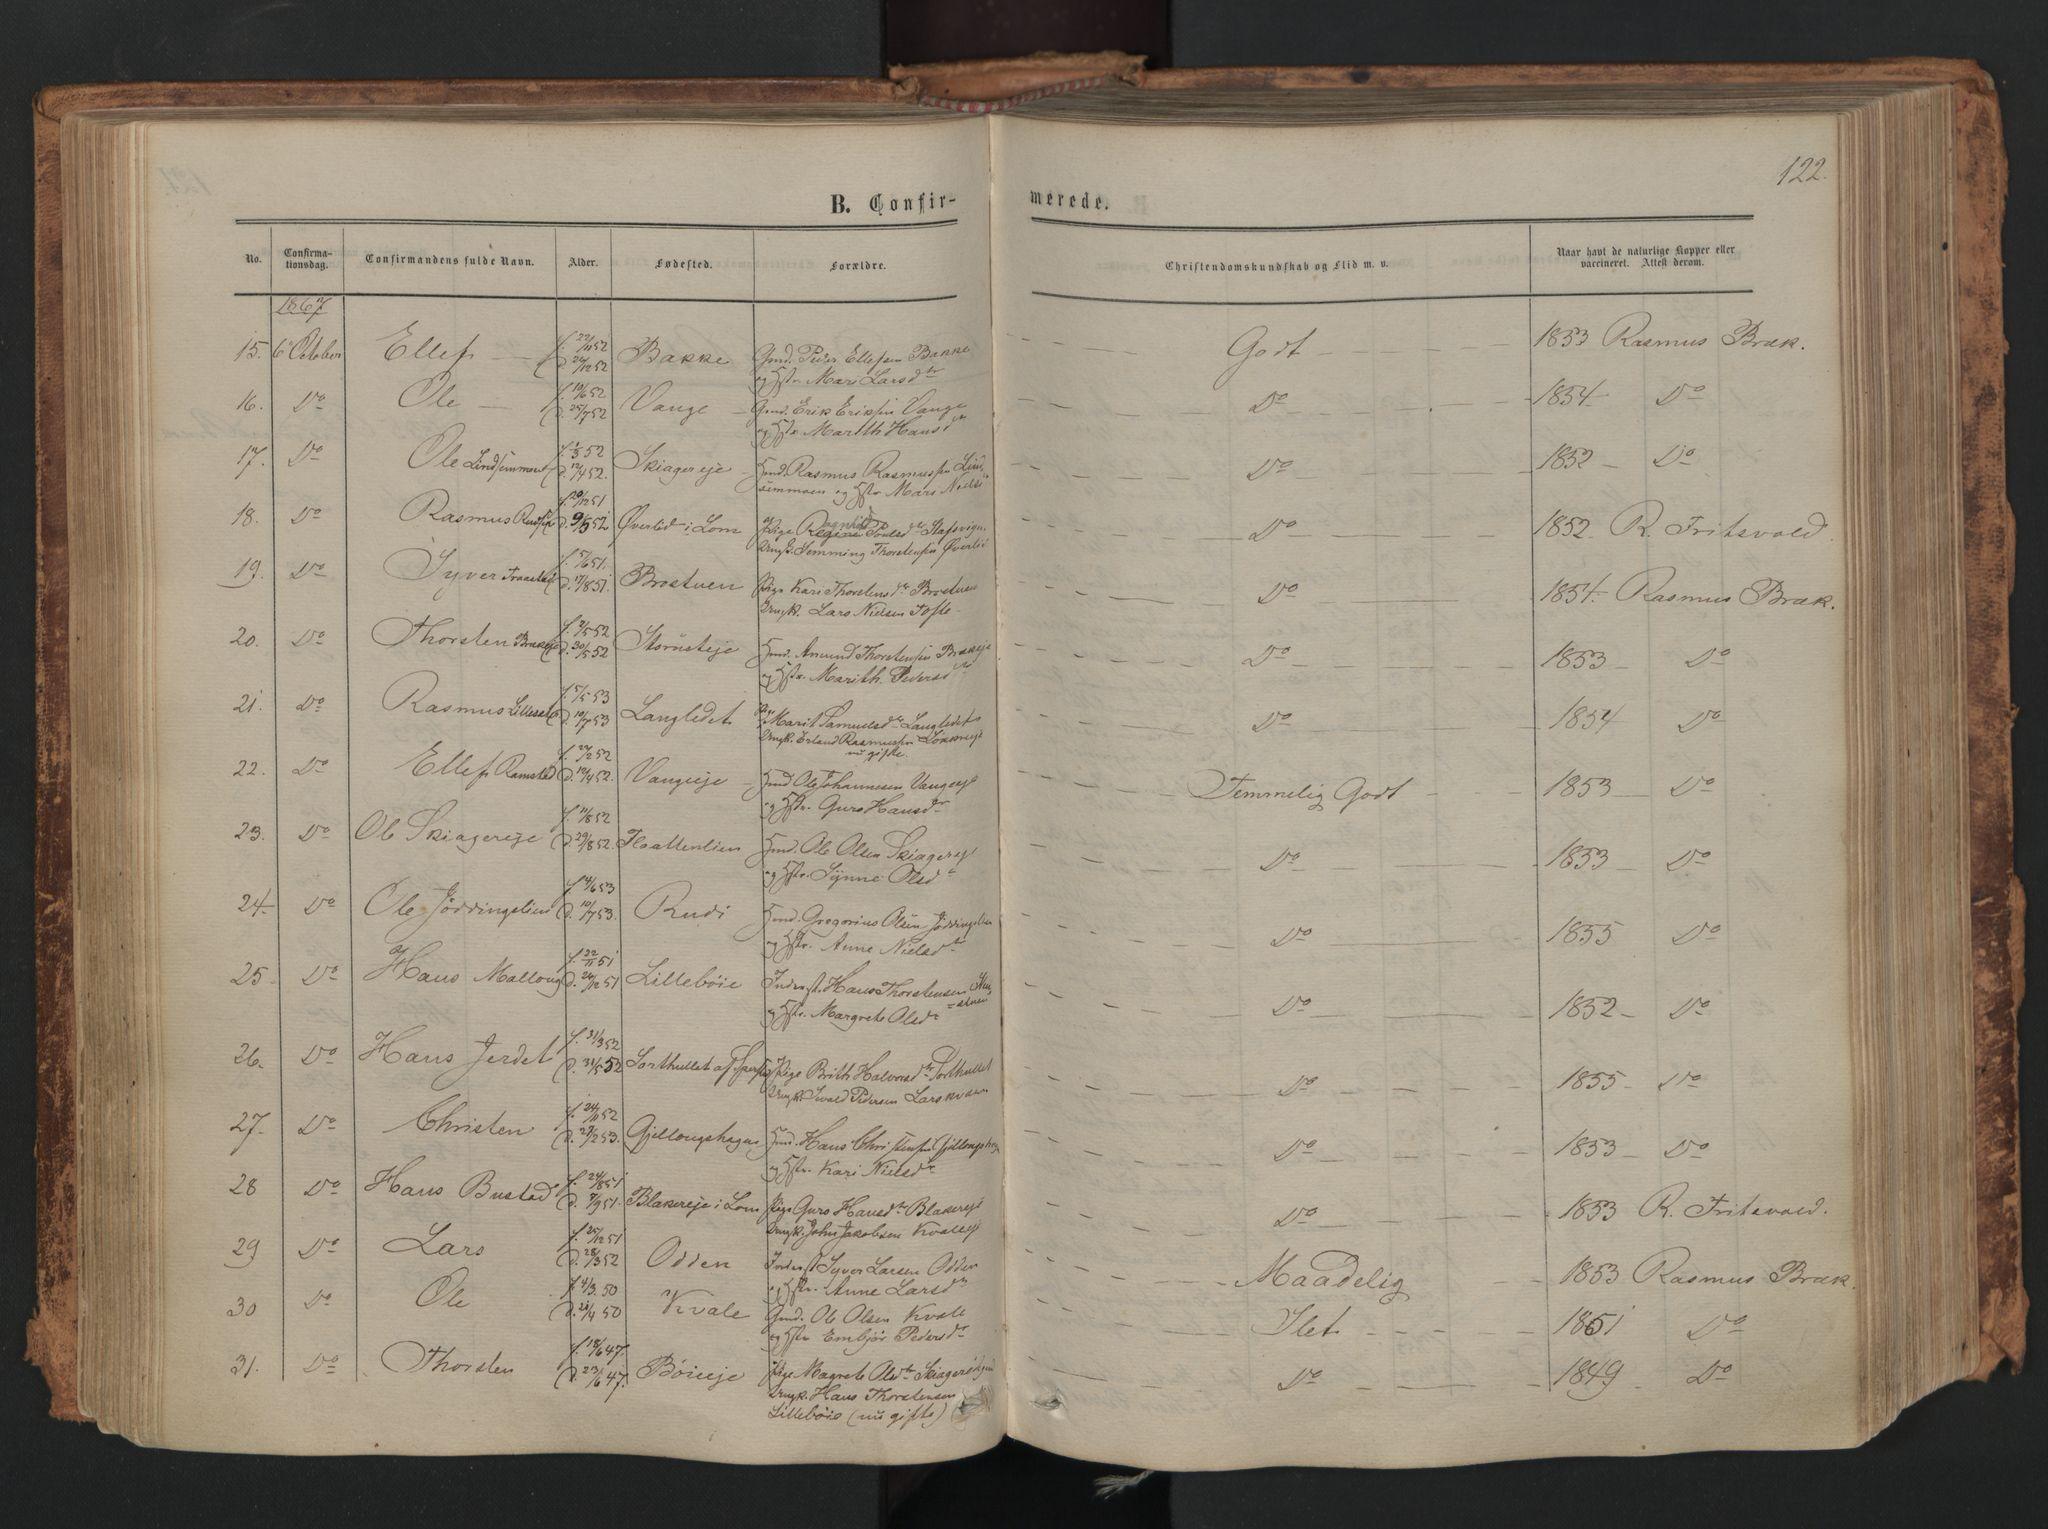 SAH, Skjåk prestekontor, Ministerialbok nr. 1, 1863-1879, s. 122